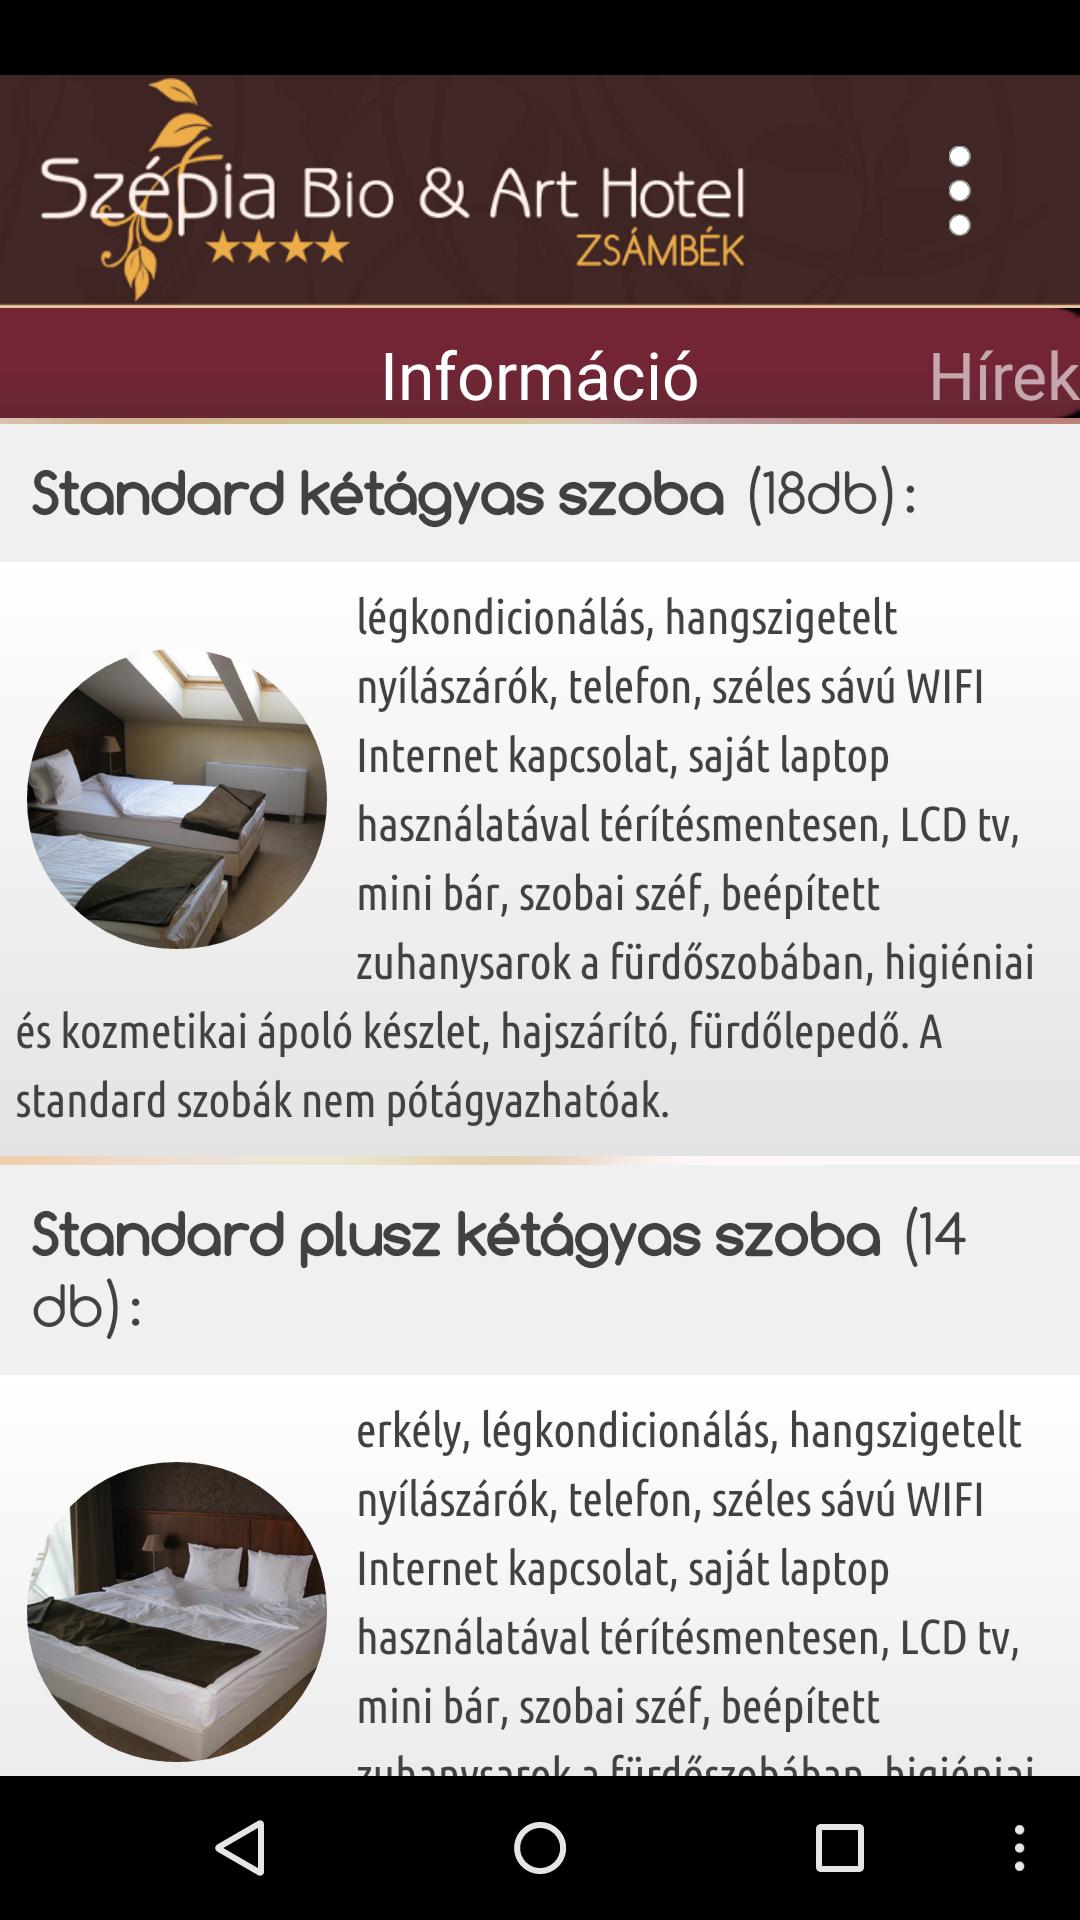 szh_szobatipusok